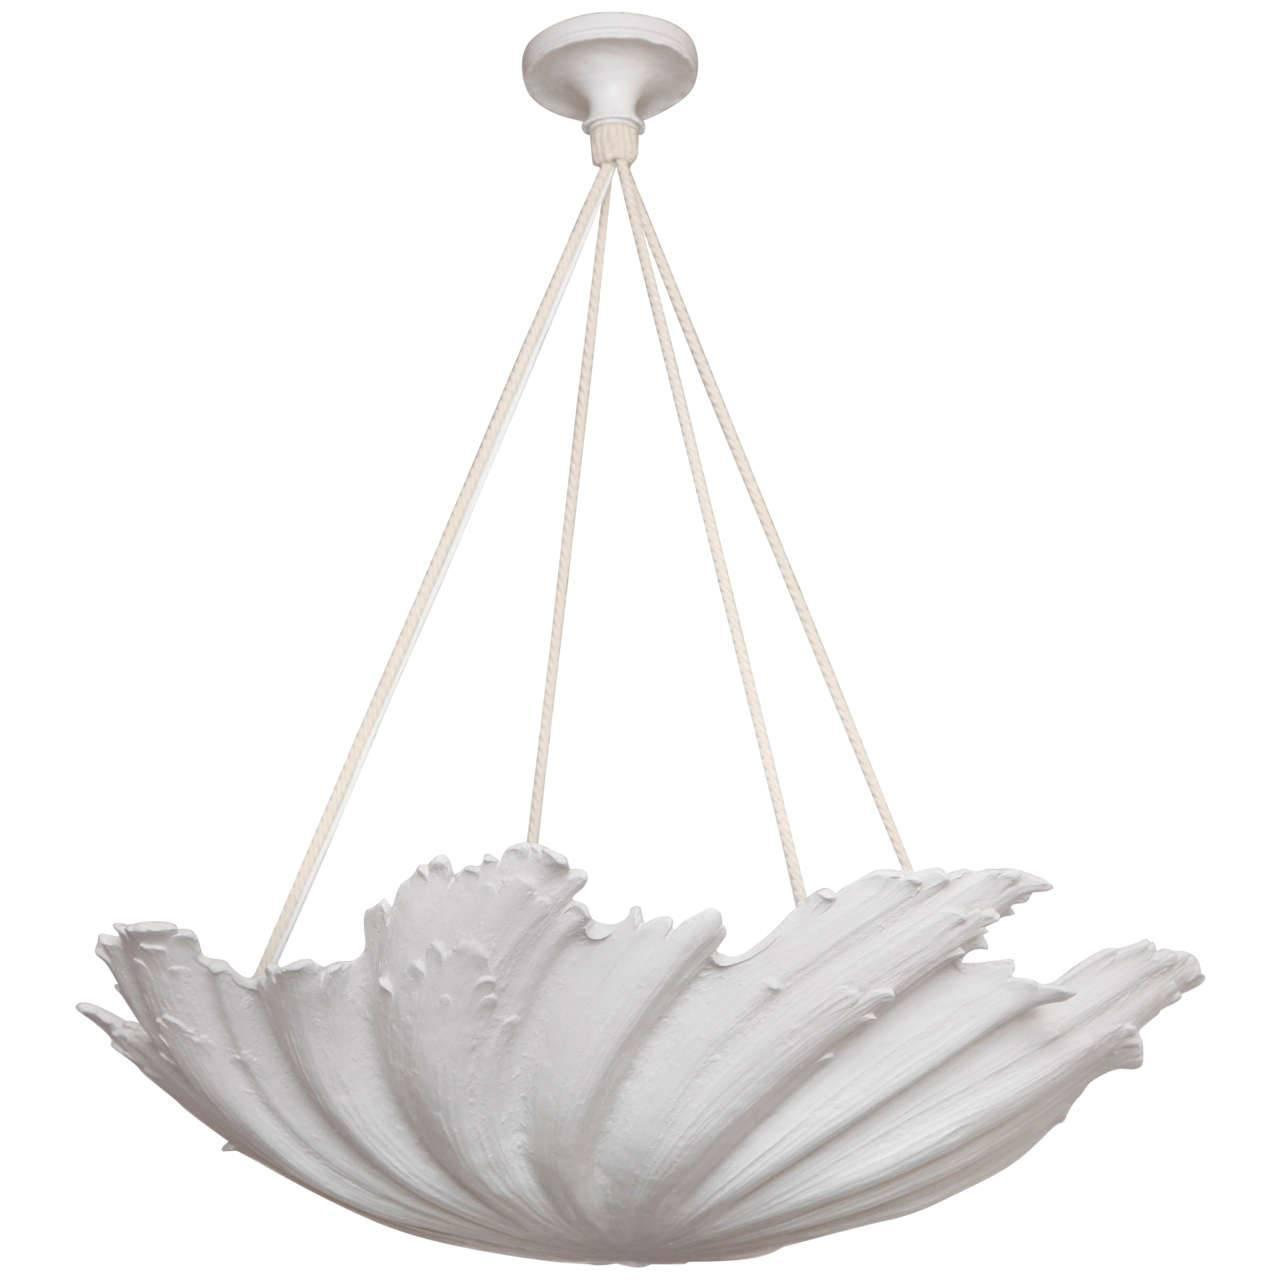 Wp sullivan plaster shell chandelier for sale at 1stdibs aloadofball Choice Image